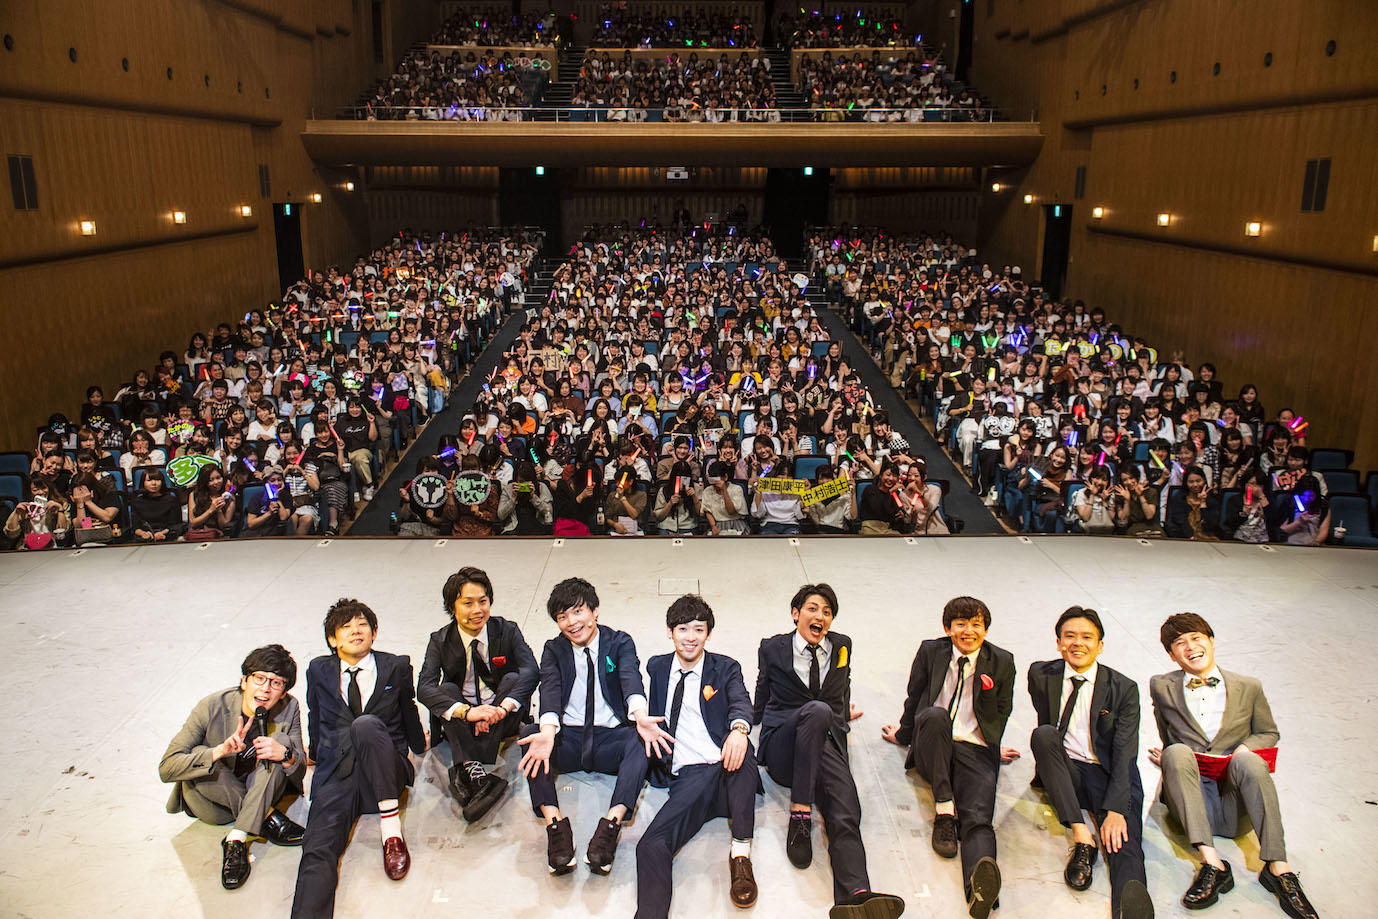 http://news.yoshimoto.co.jp/20180912104538-35c5edecf7aeba5d0944f521ec14e3539d7837d3.jpg